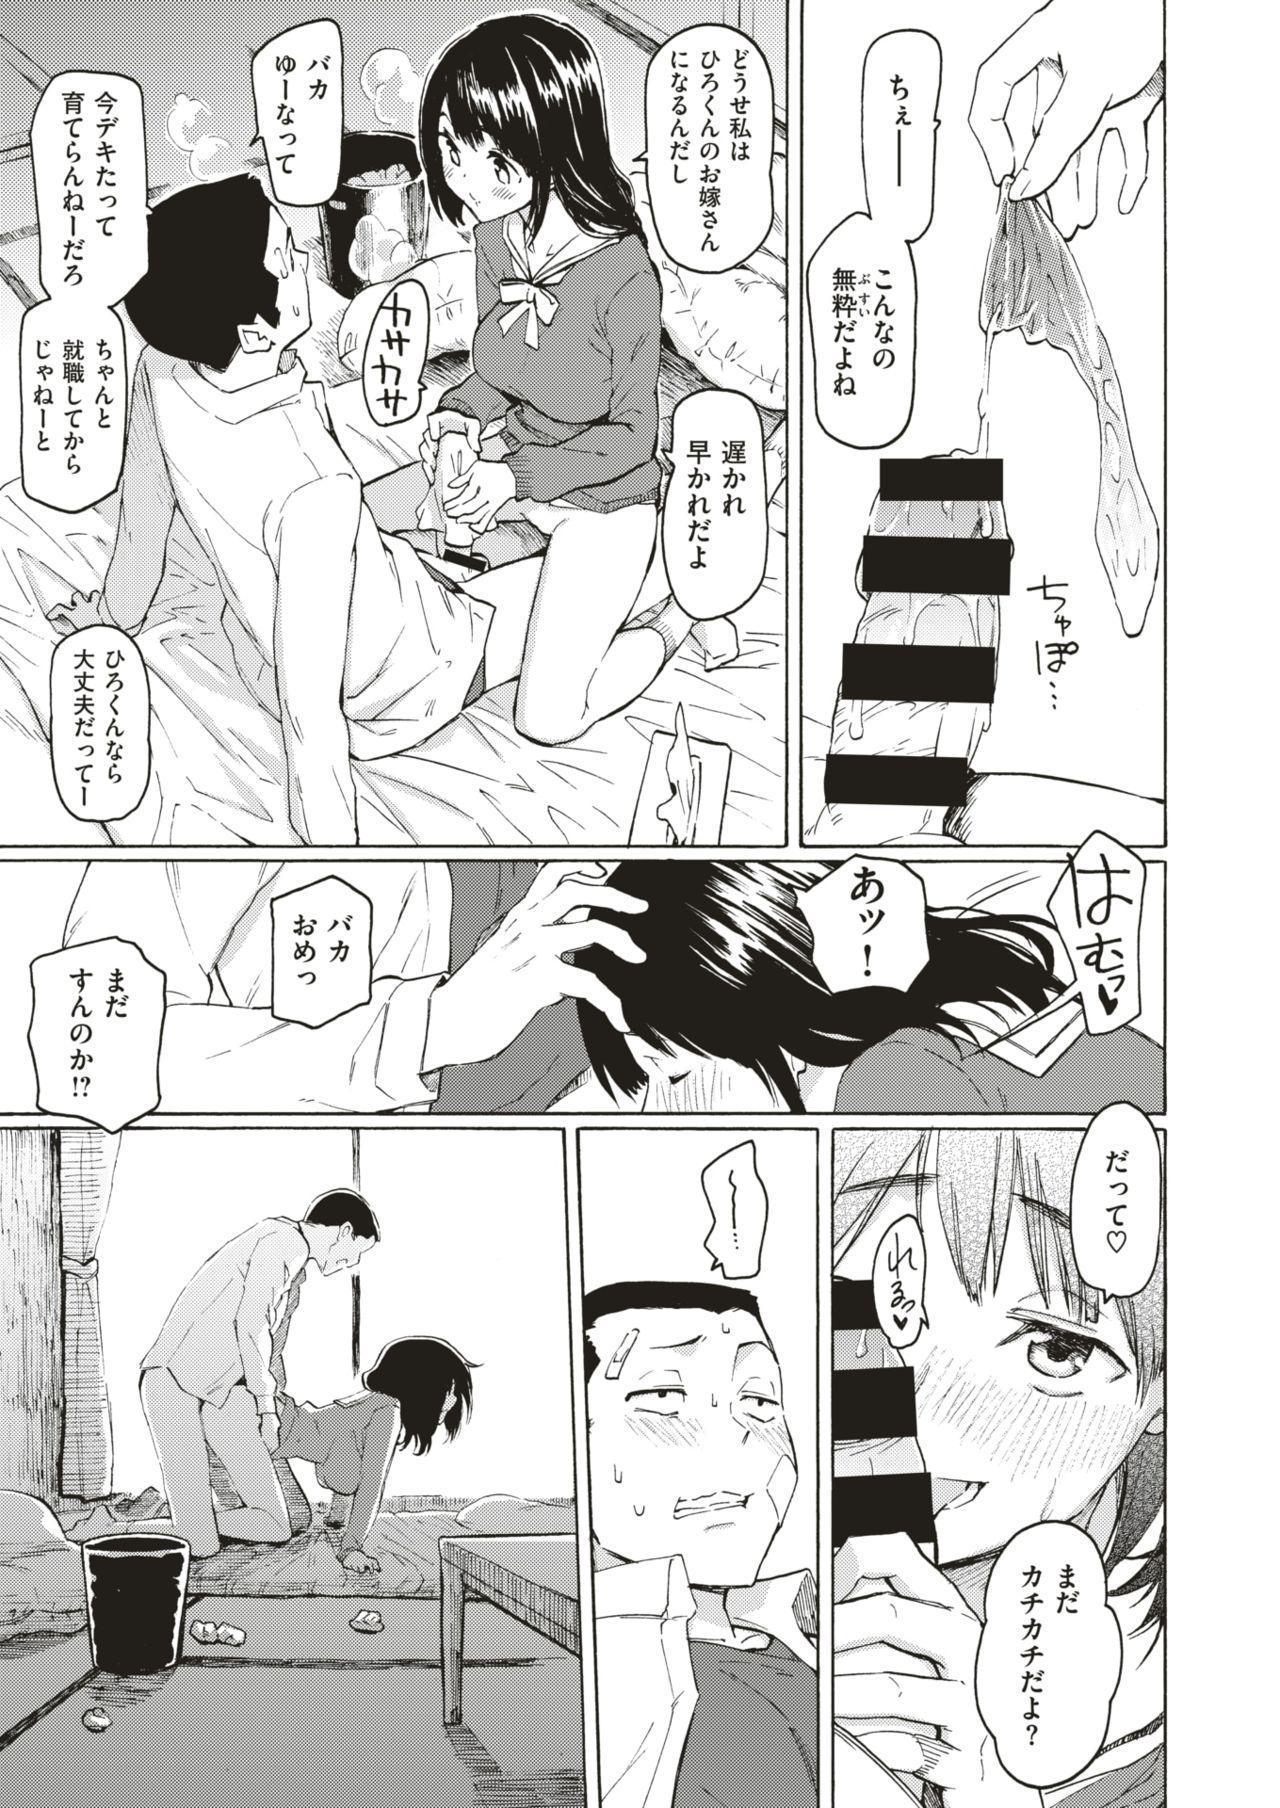 COMIC HAPPINING Vol. 4 3